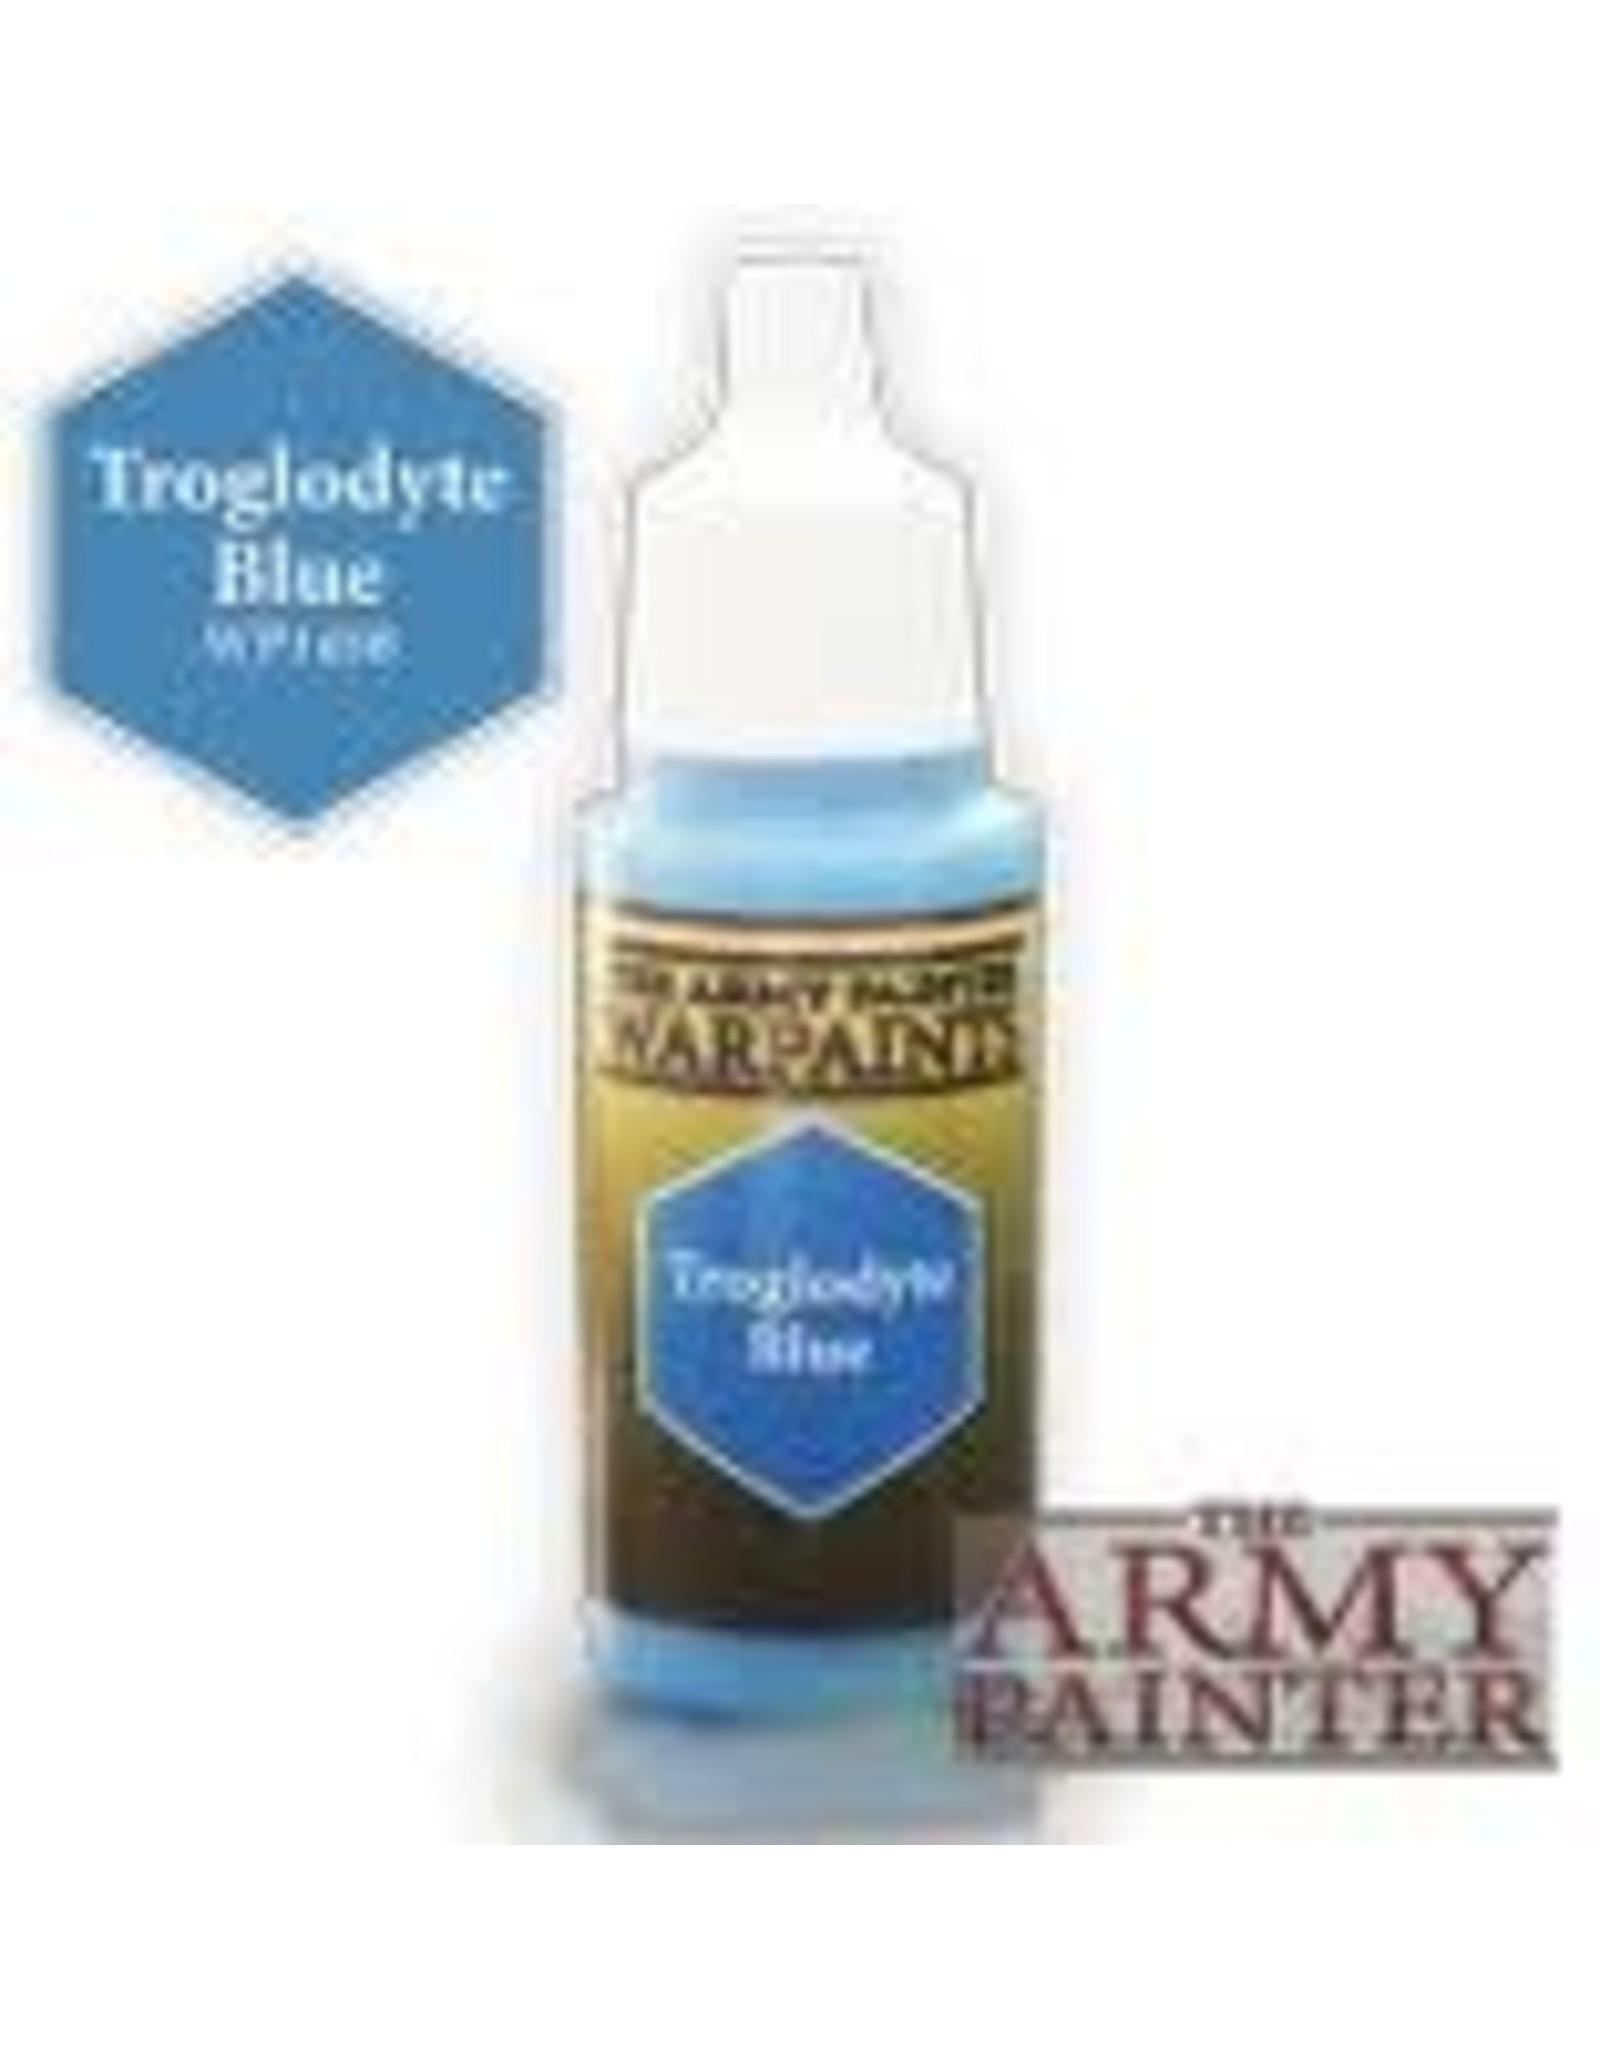 Army Painter Army Painter: Troglodyte Blue